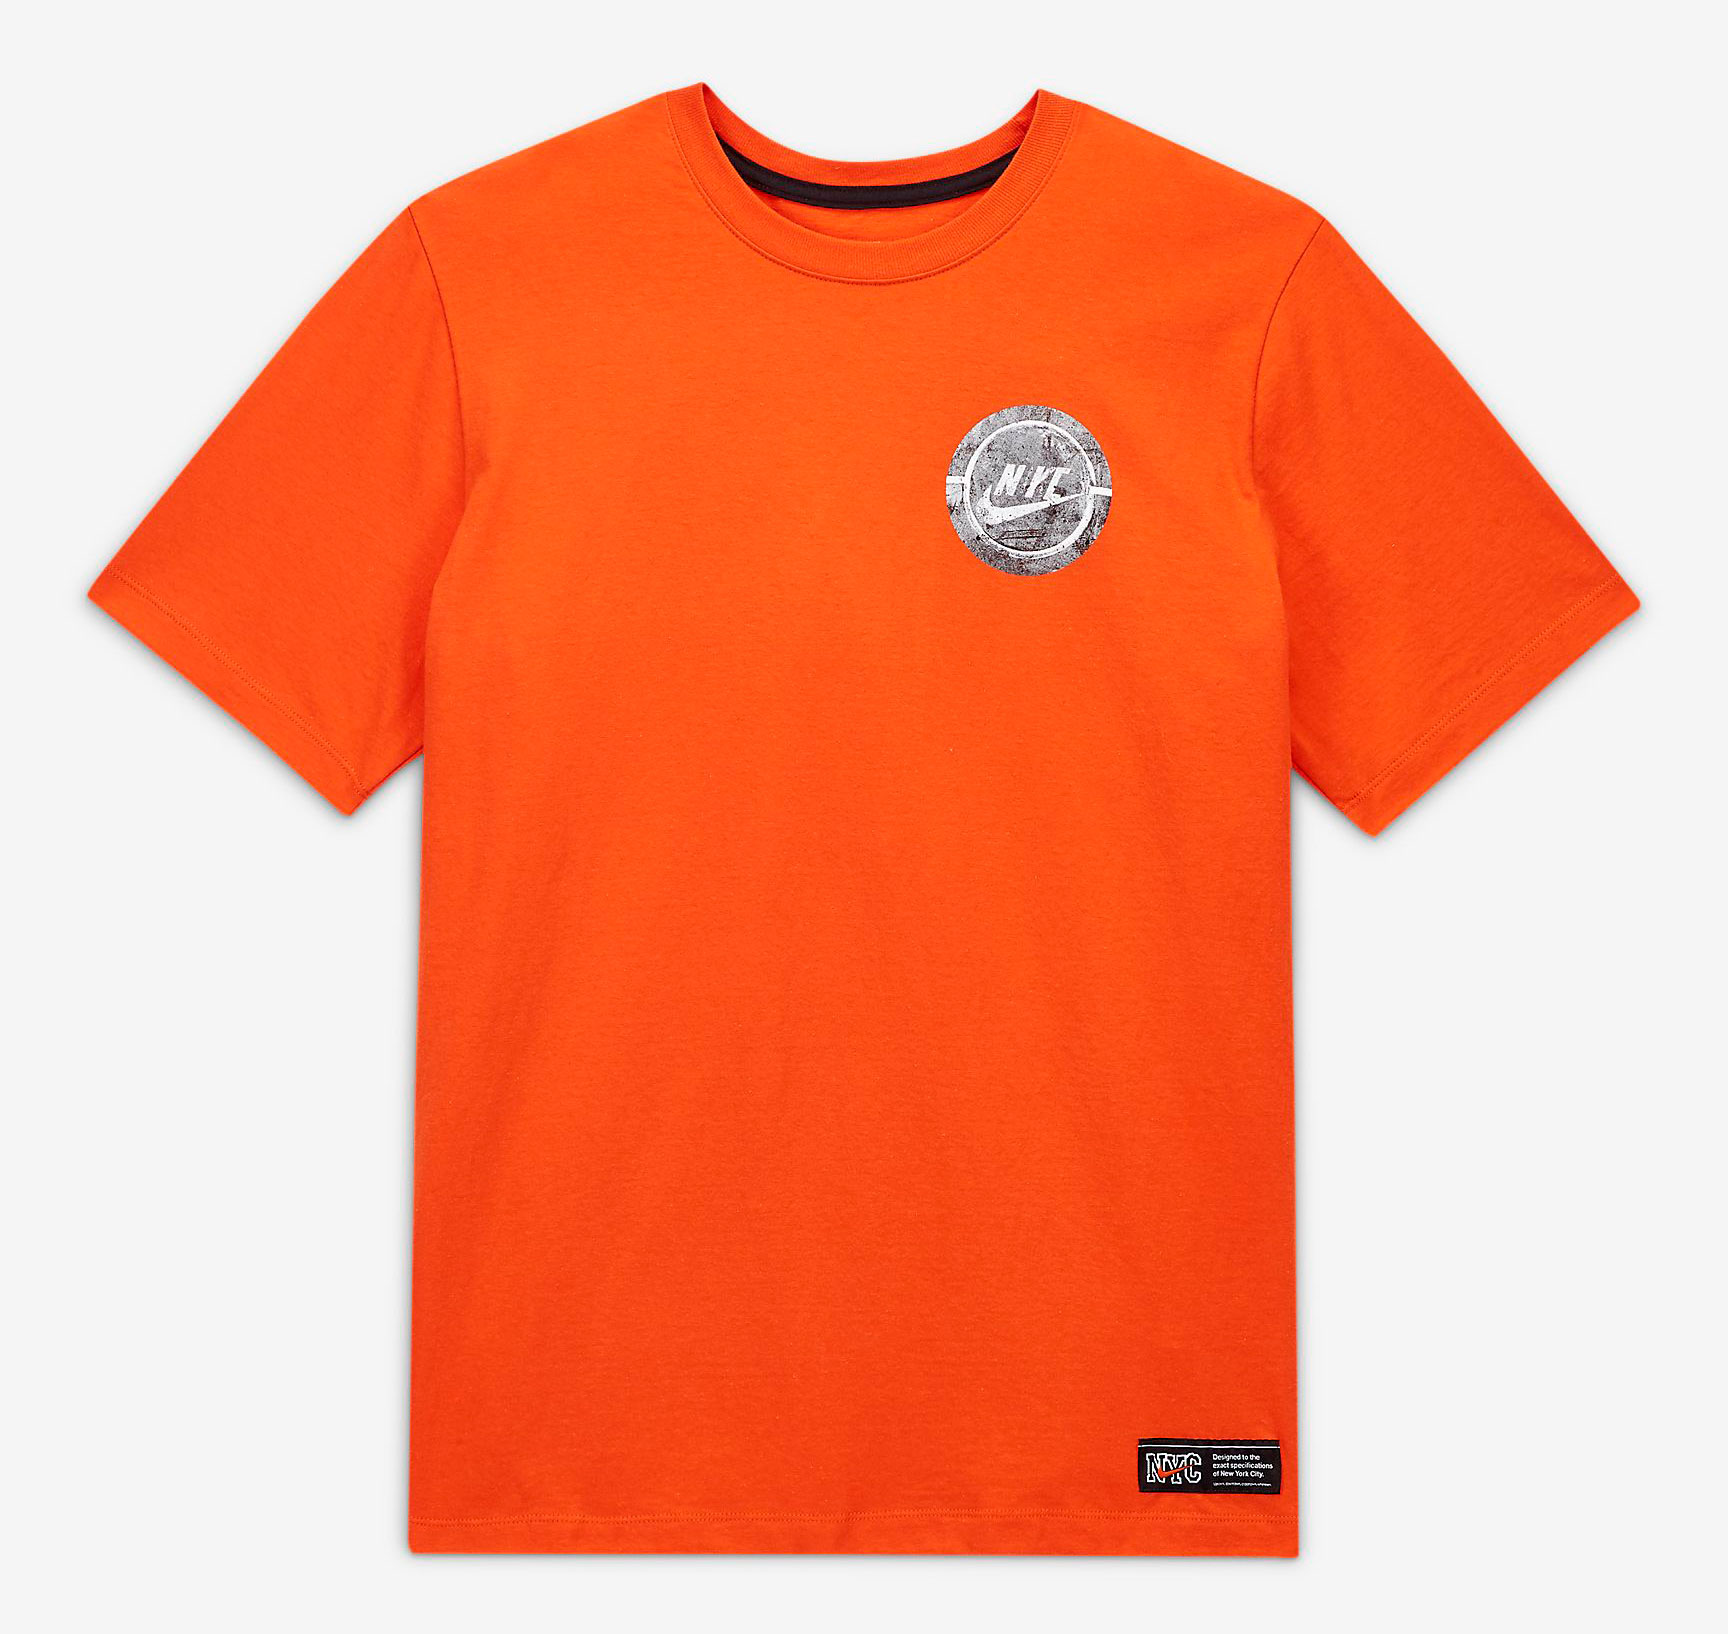 nike-sportswear-nyc-team-orange-t-shirt-1